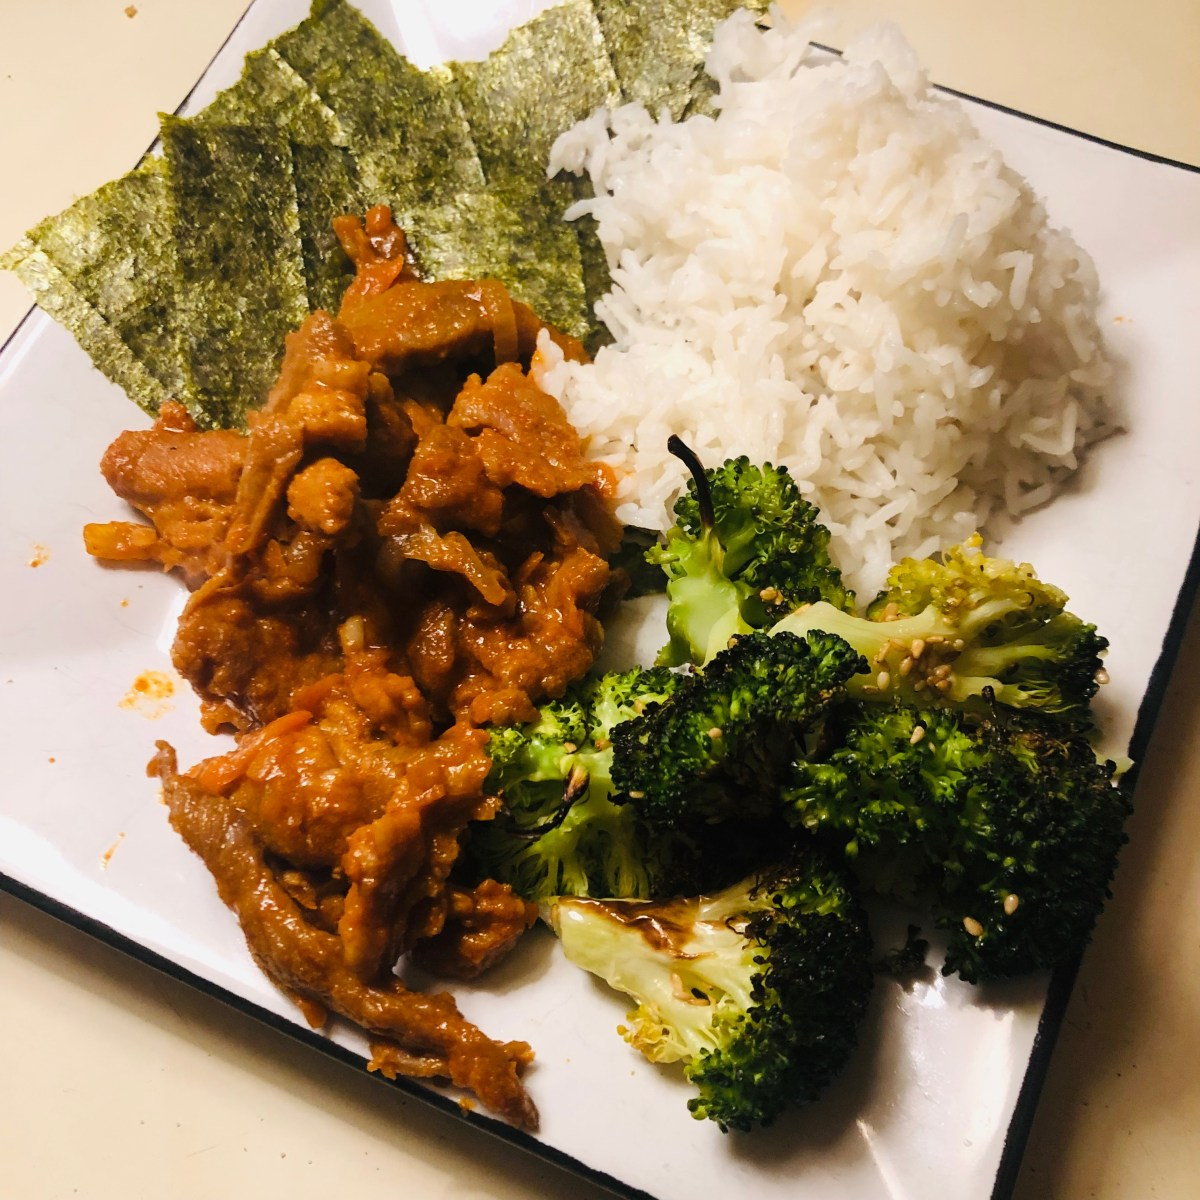 What's for supper? Vol. 161: Taste the rainbulgoki